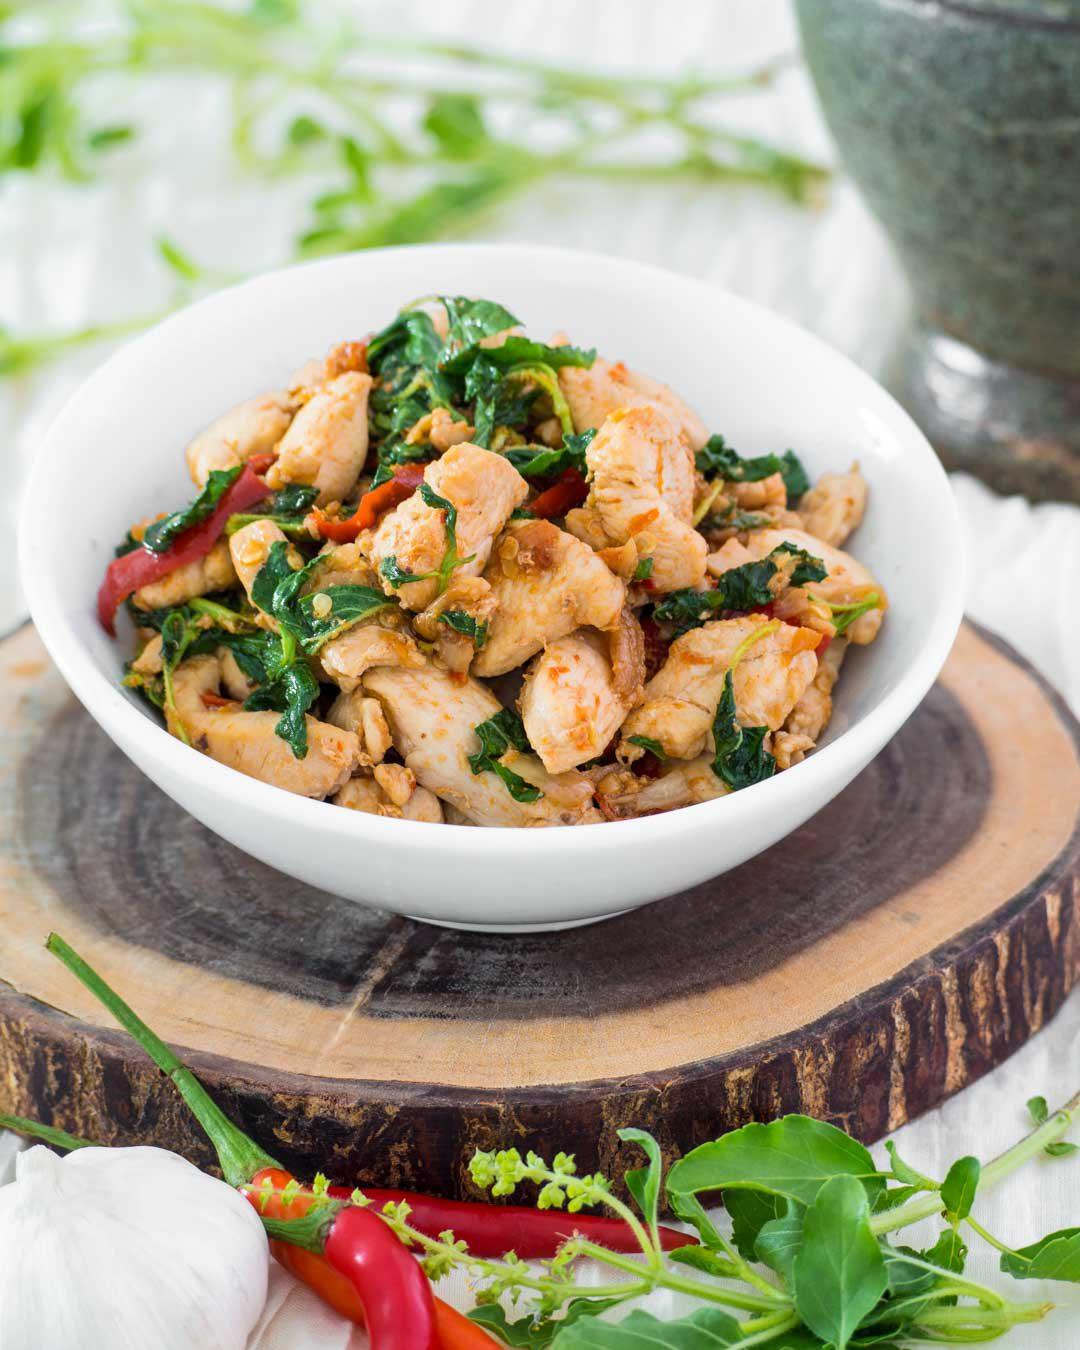 thai holy basil chicken or pad kraprao gai in a white bowl